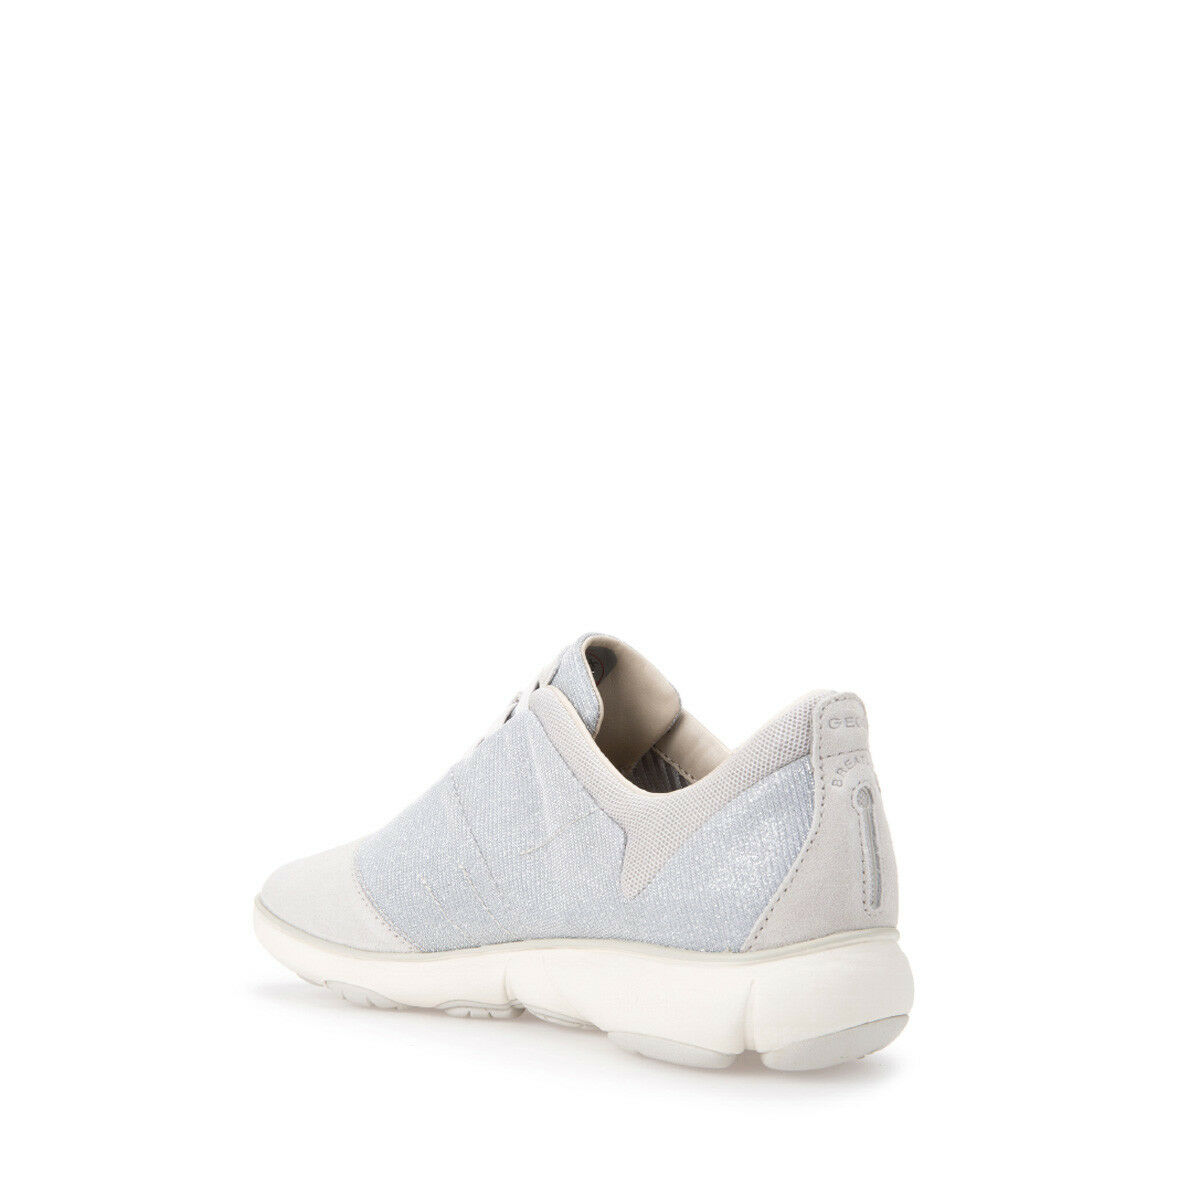 GEOX leggere Scarpe donna NEBULA D641EG scarpe da ginnastica slip-on leggere GEOX in tela e camoscio bfaa4a